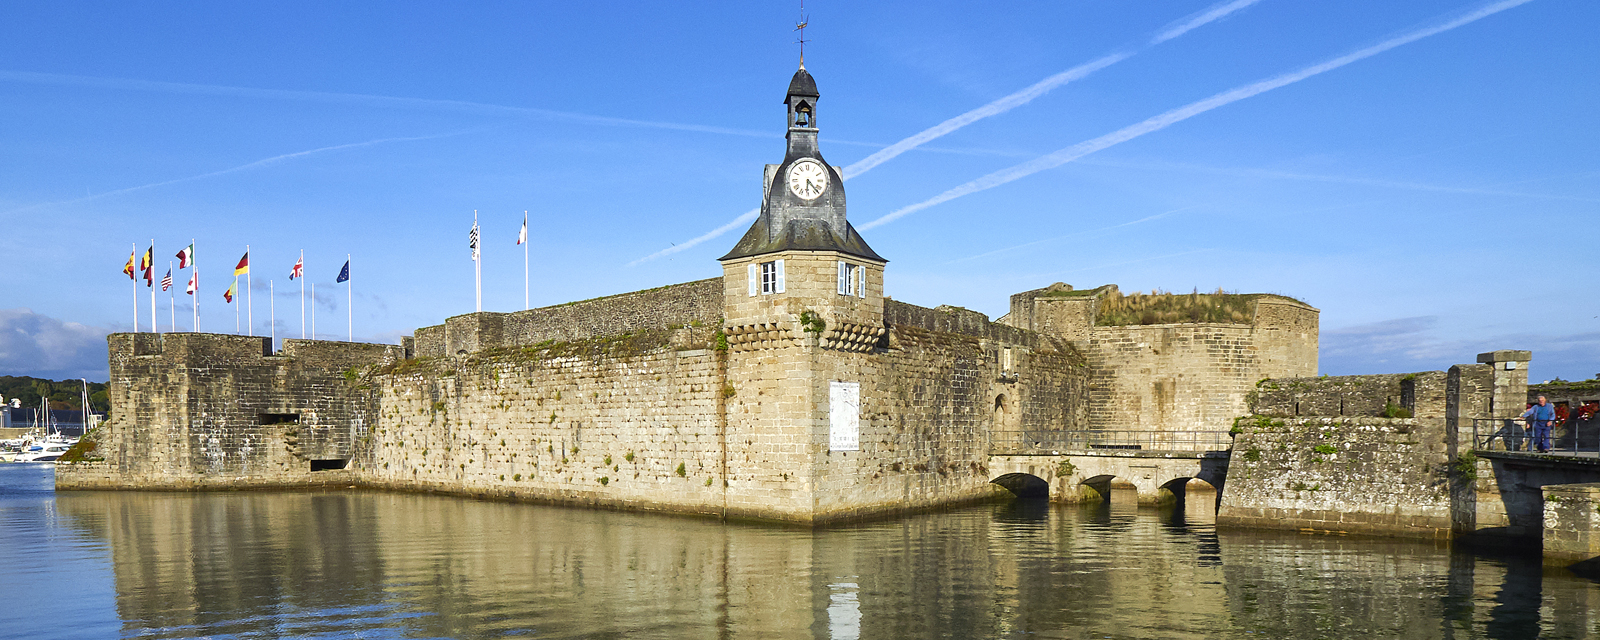 The citadel of Concarneau